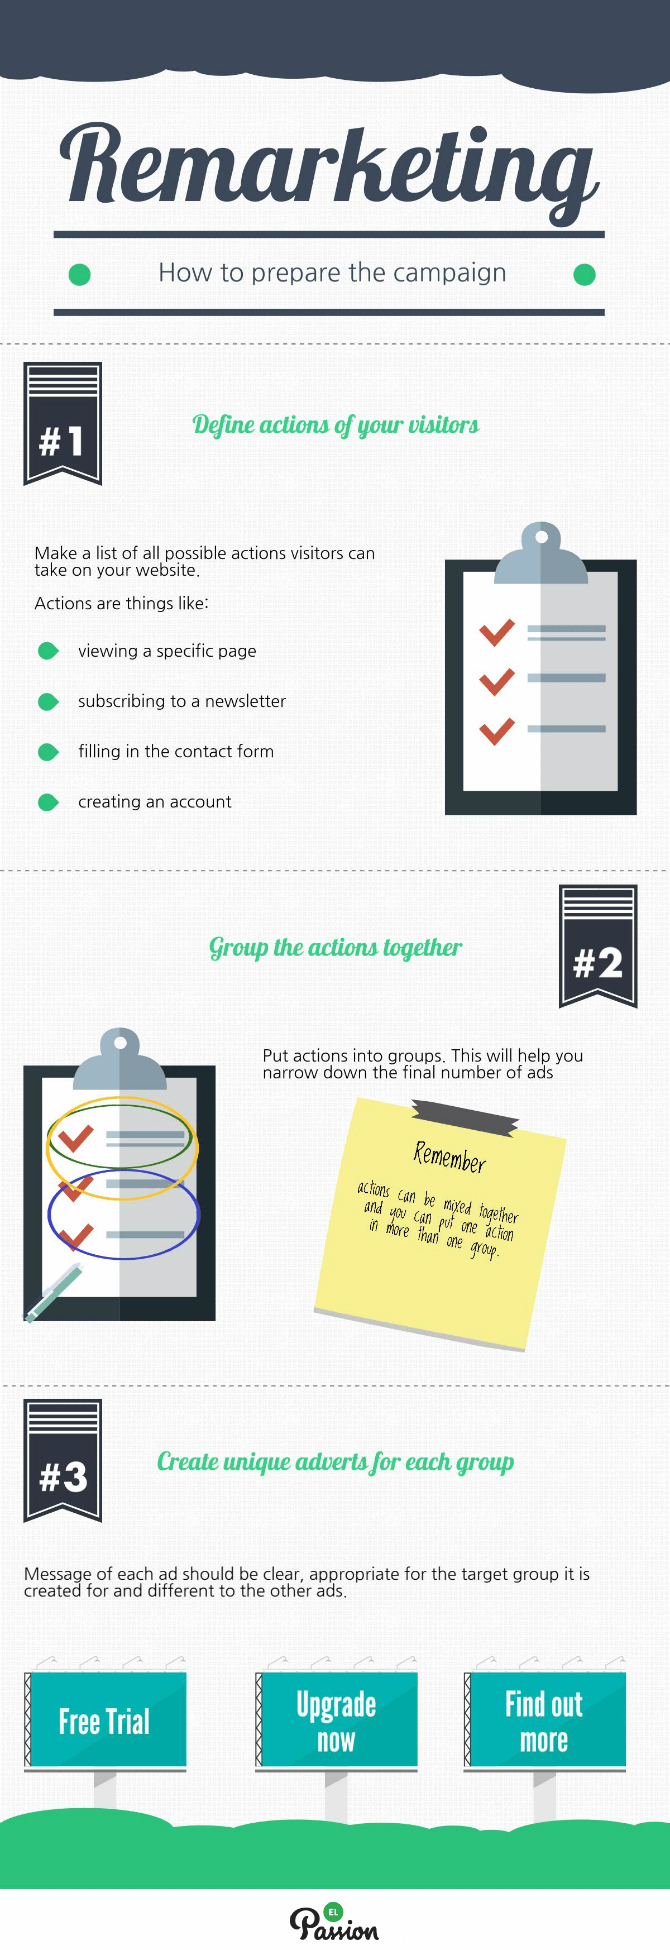 remarketing-infographic-elpassion